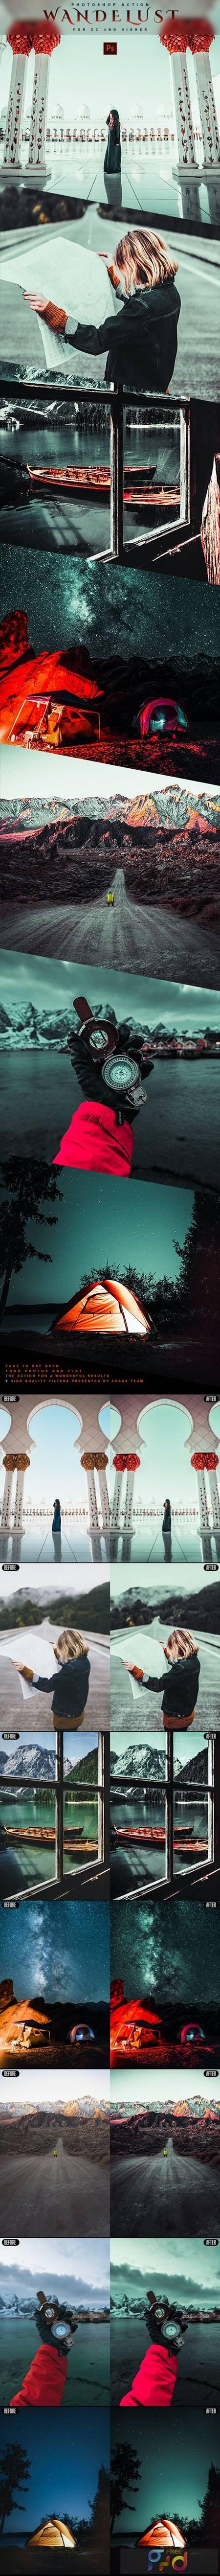 Wanderlust - Photoshop Action 28854054 1